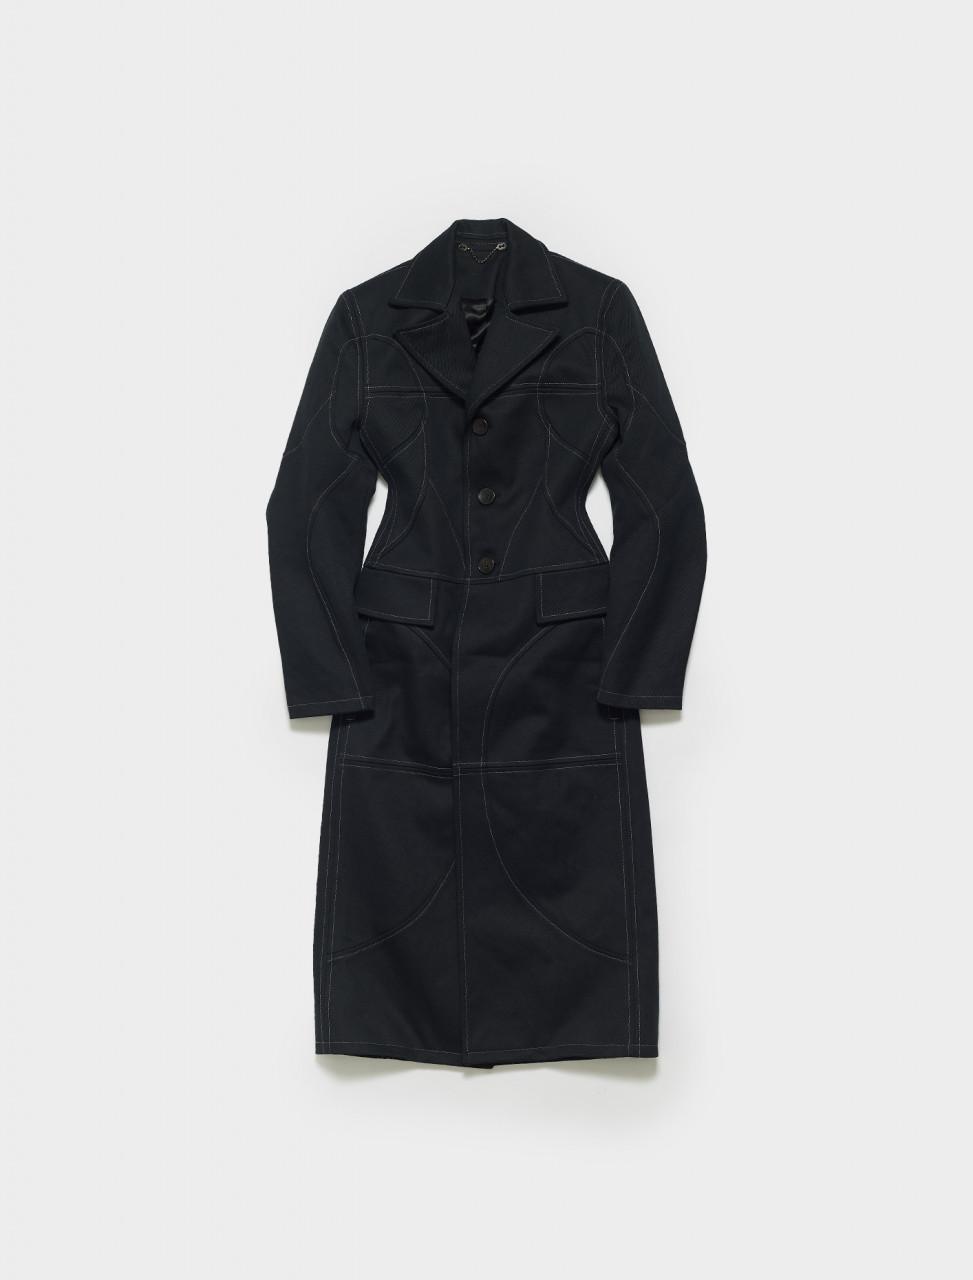 AISHA_W-BLACK GMBH AISHA STRUCTURED COAT BLACK